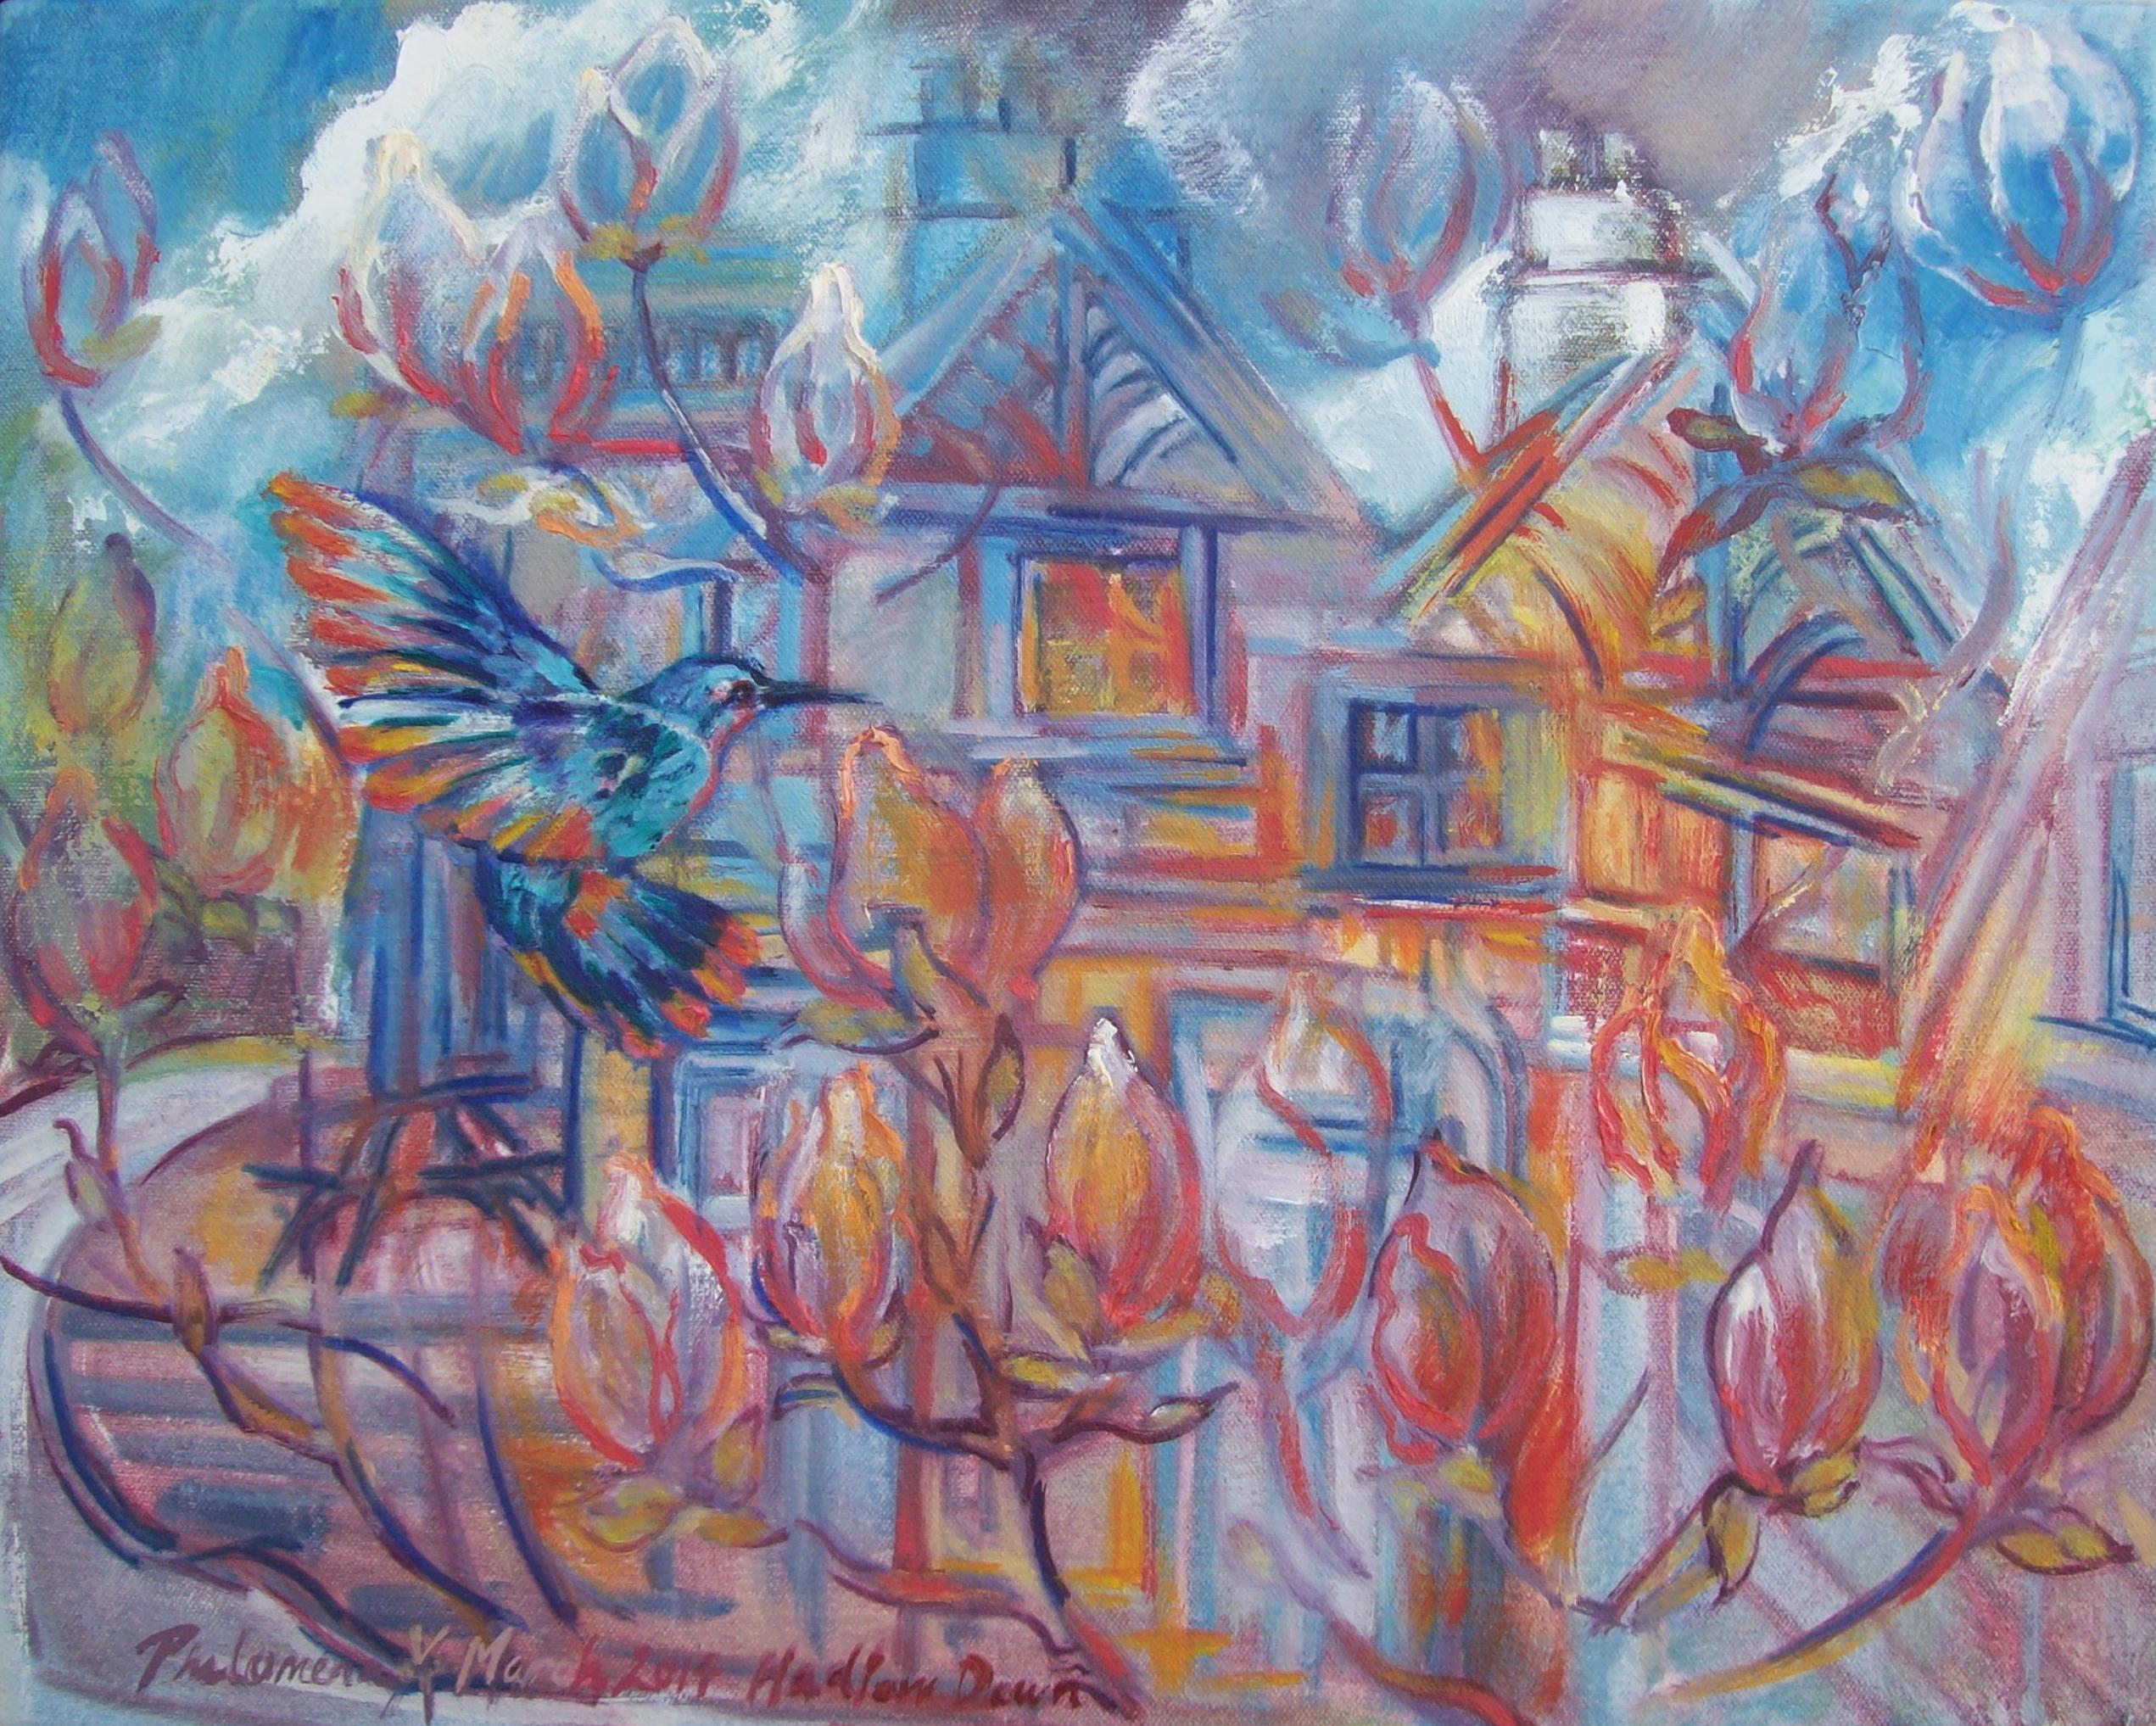 Flaming Magnolias, Hadlow Down, painting by Philomena Harmsworth